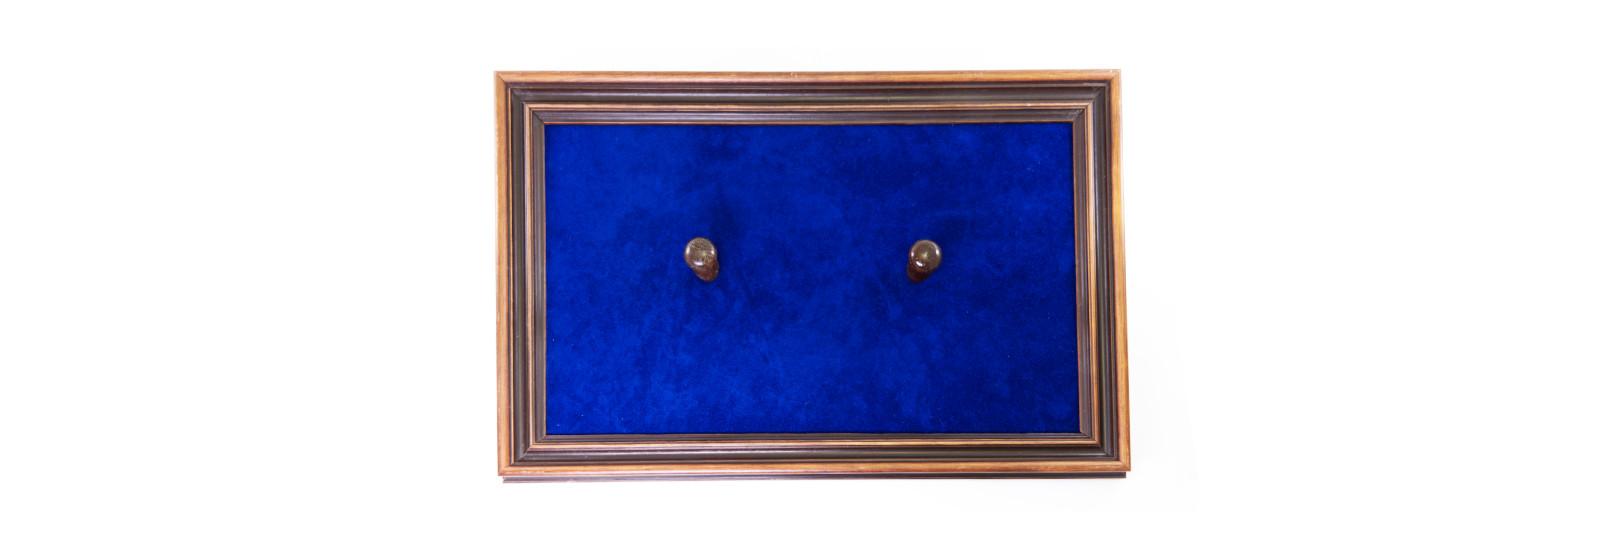 Wooden display panel